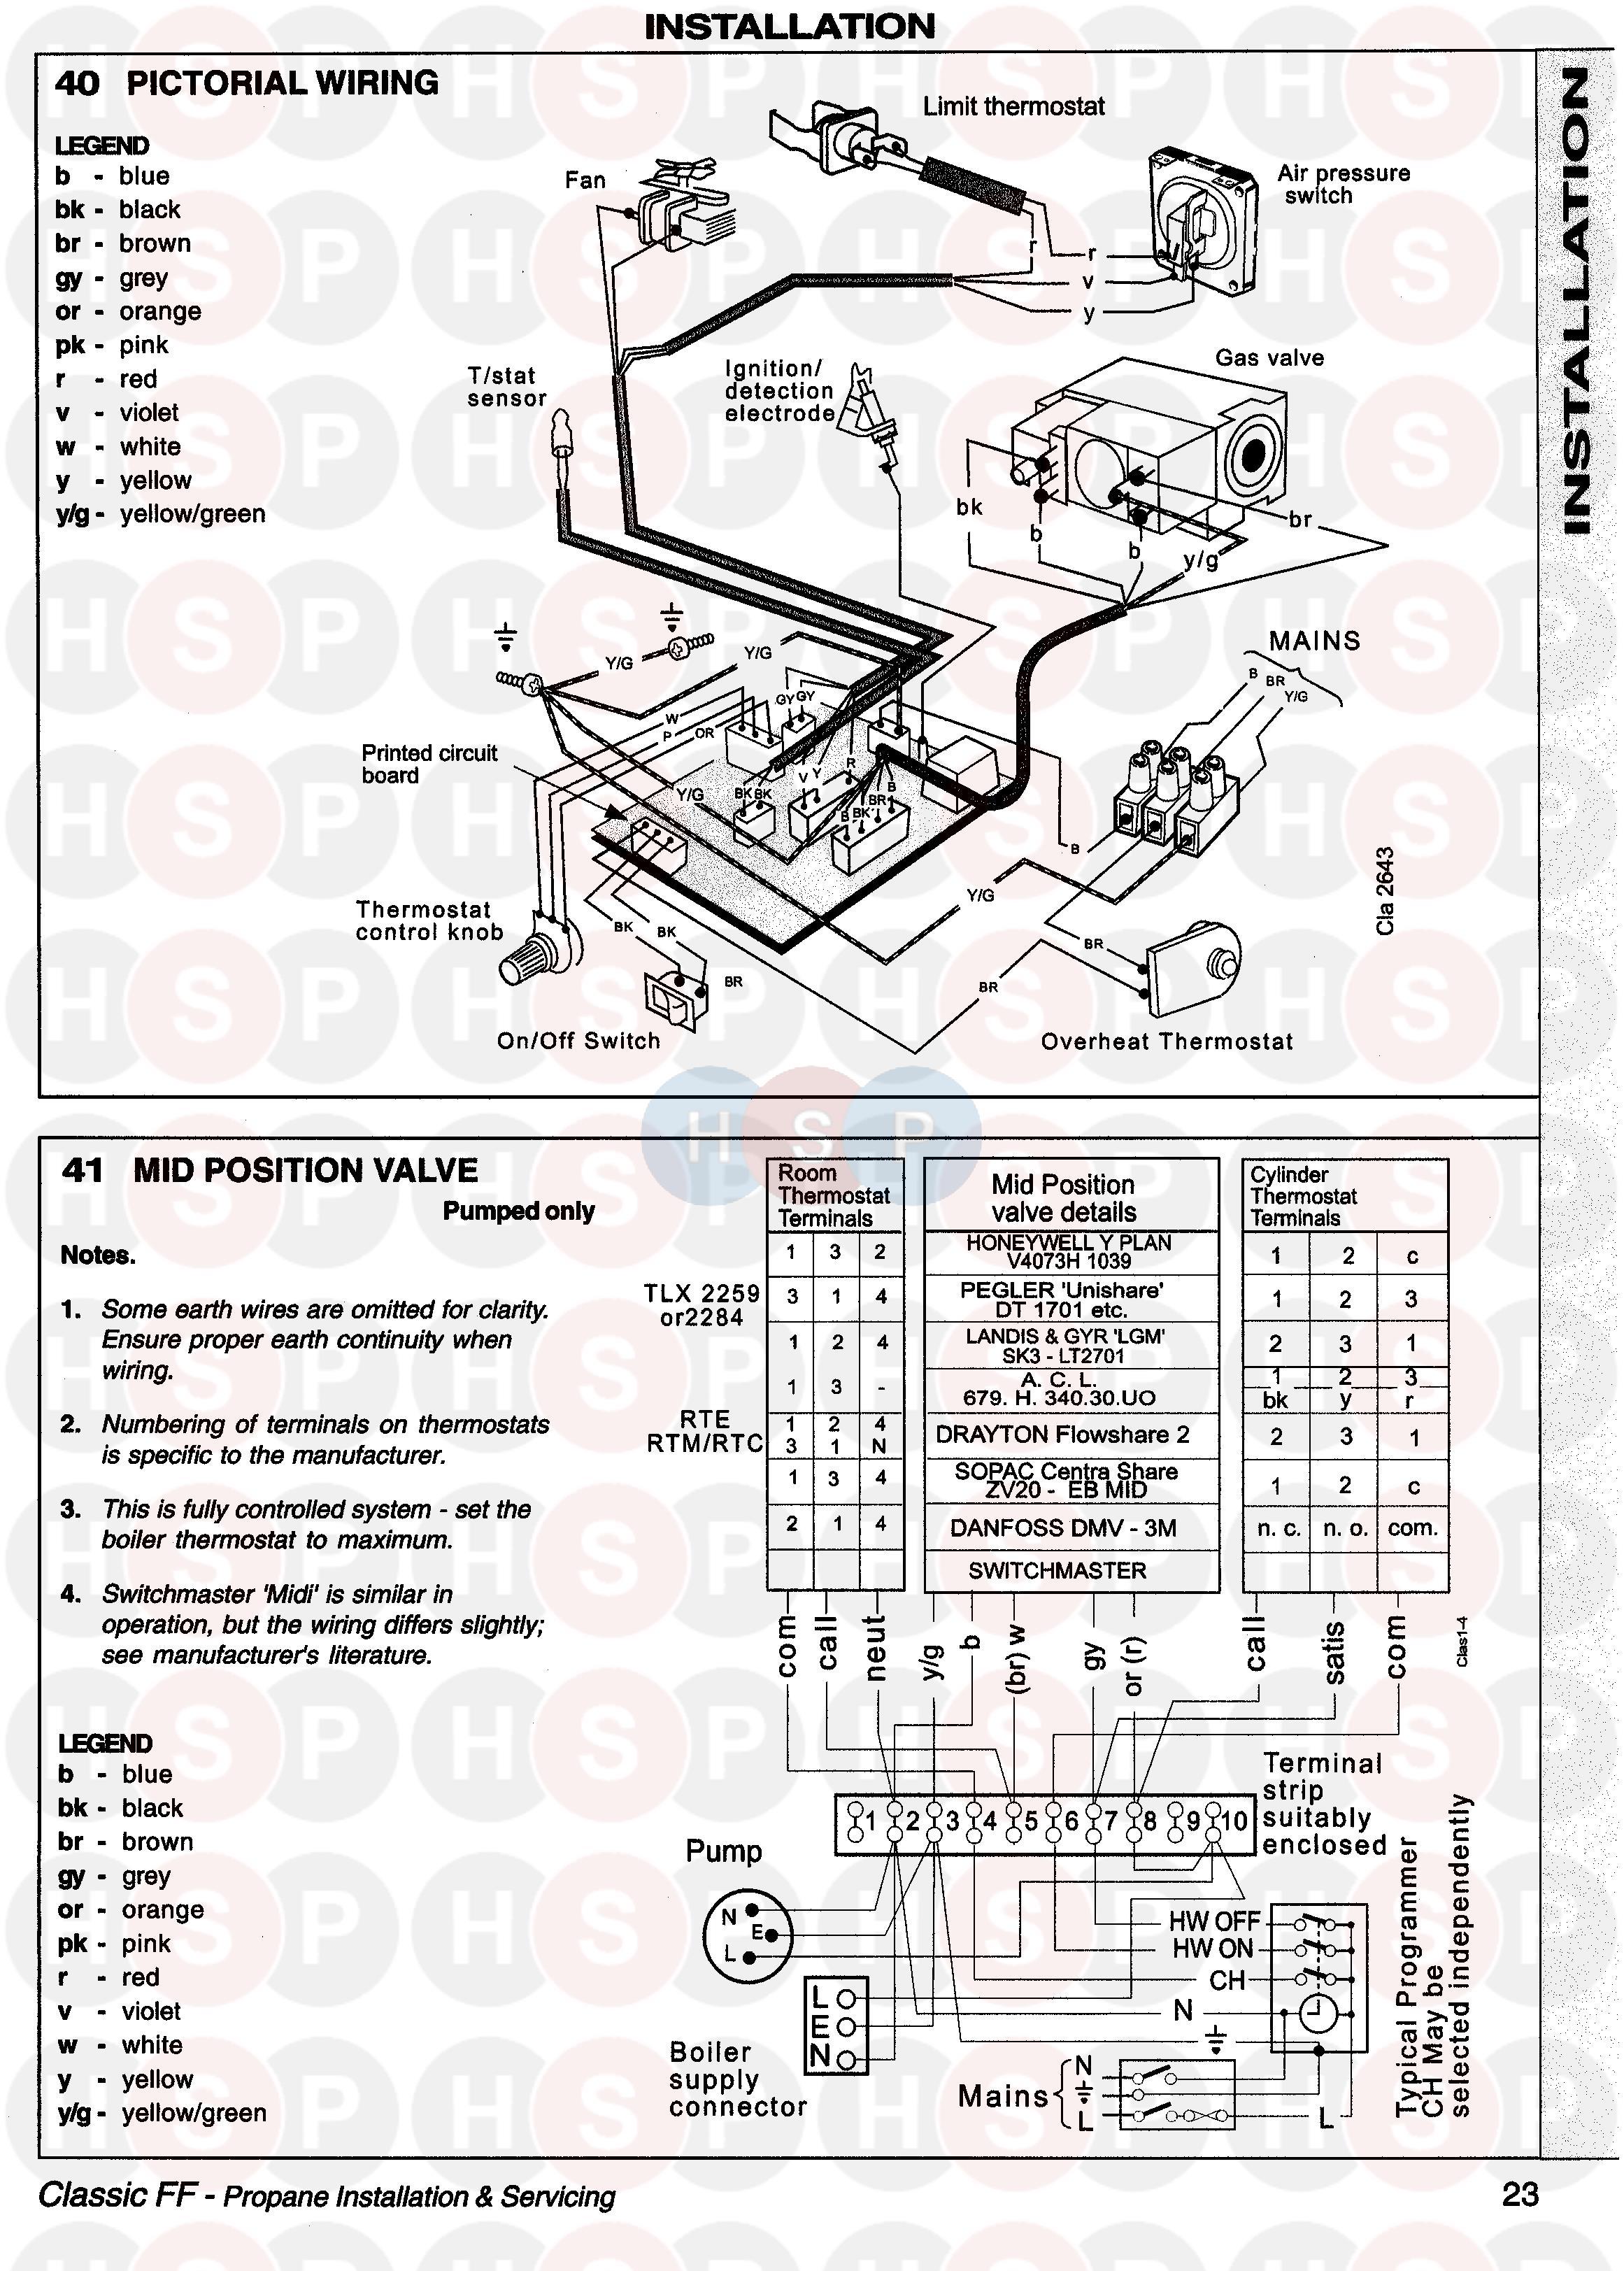 ideal classic ff340 lf appliance diagram  wiring 2